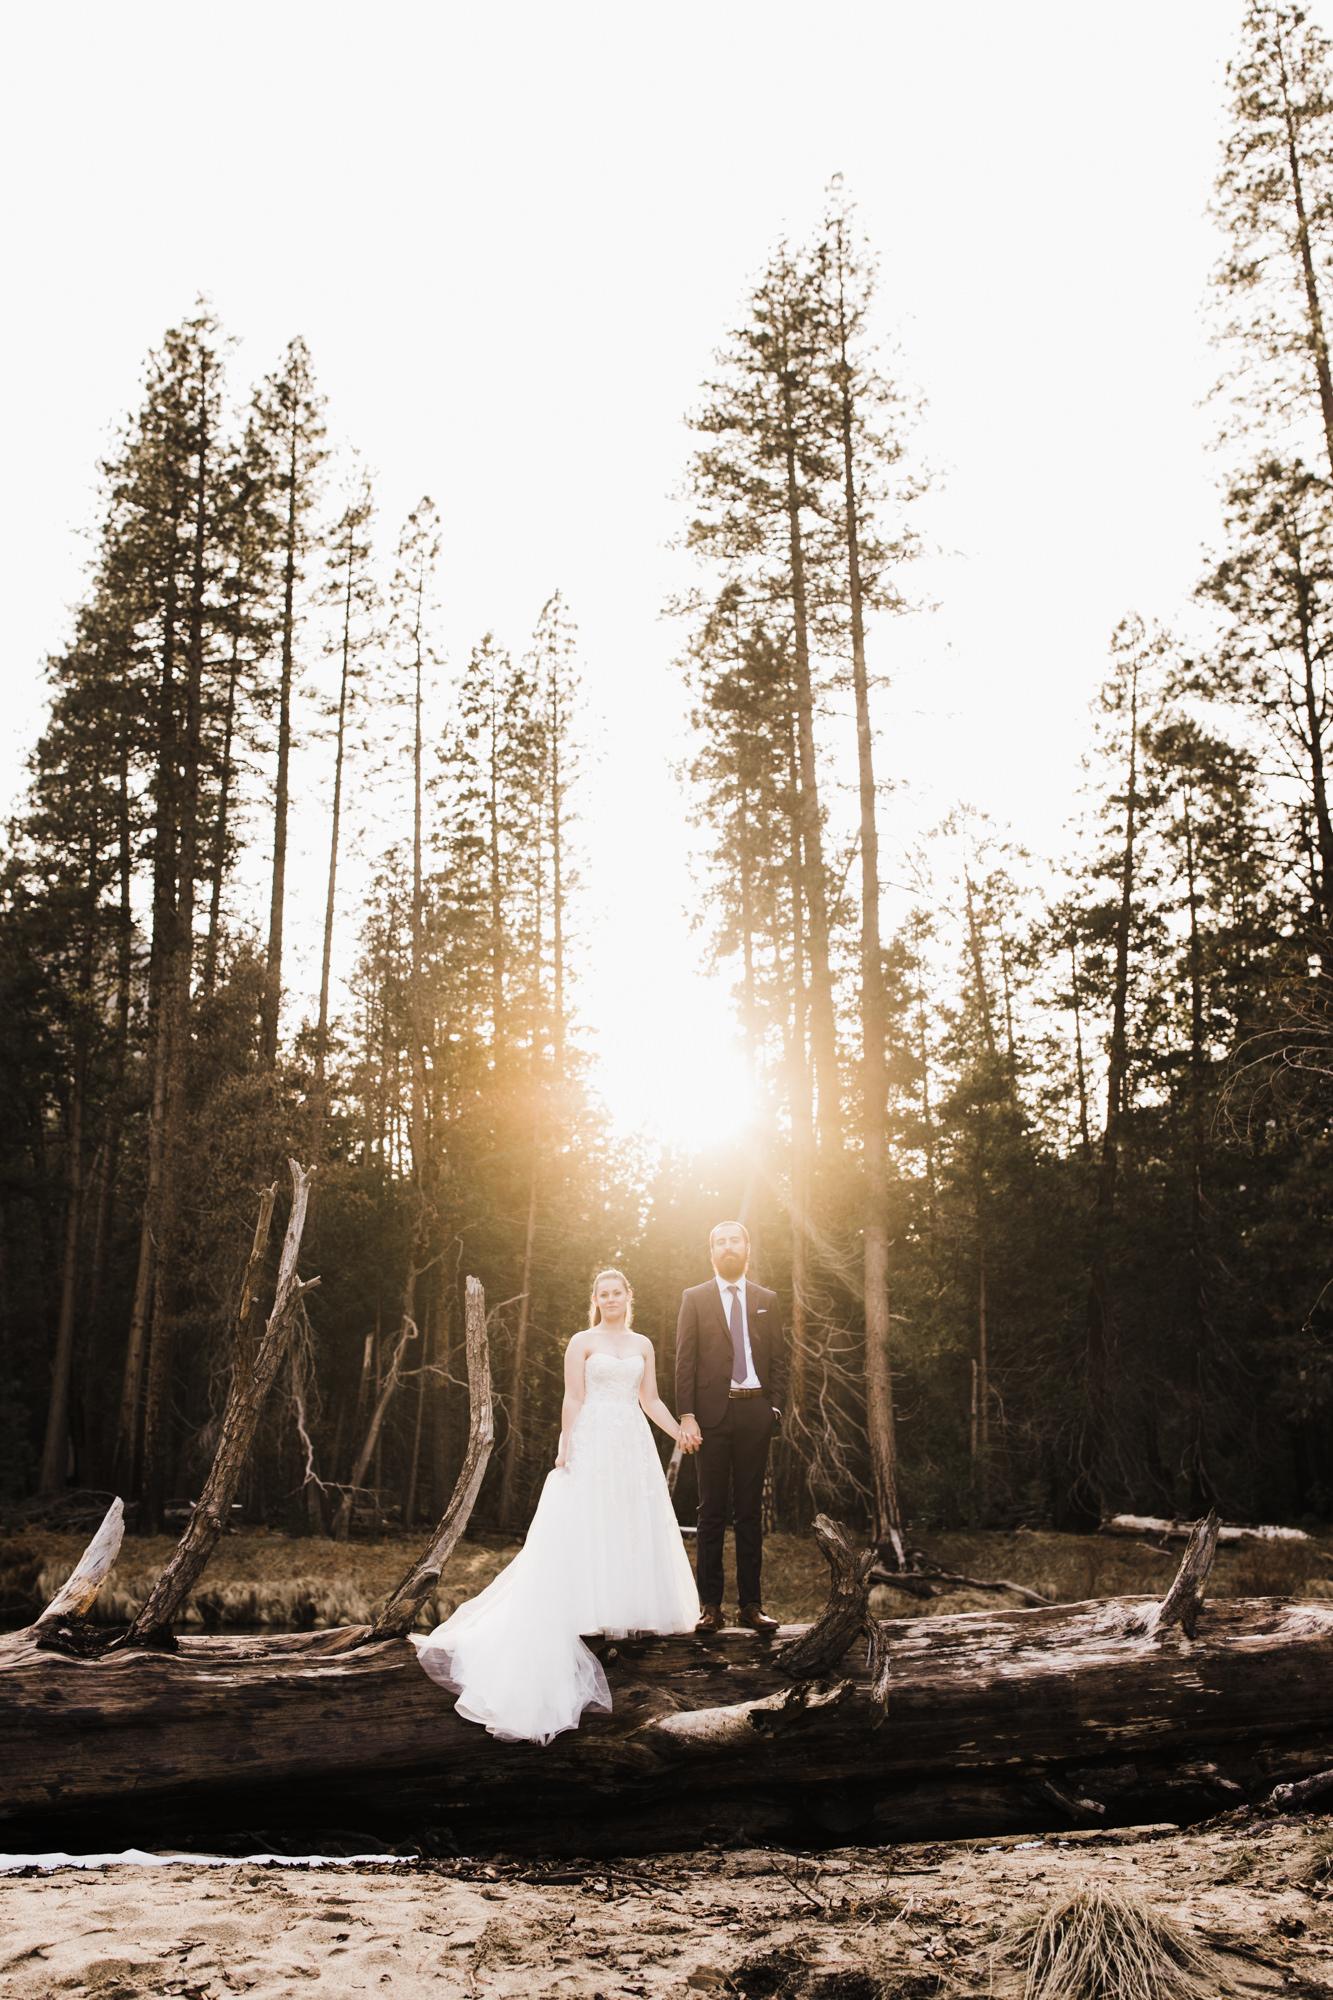 winter elopement wedding in yosemite national park | The Hearnes Adventure Photography